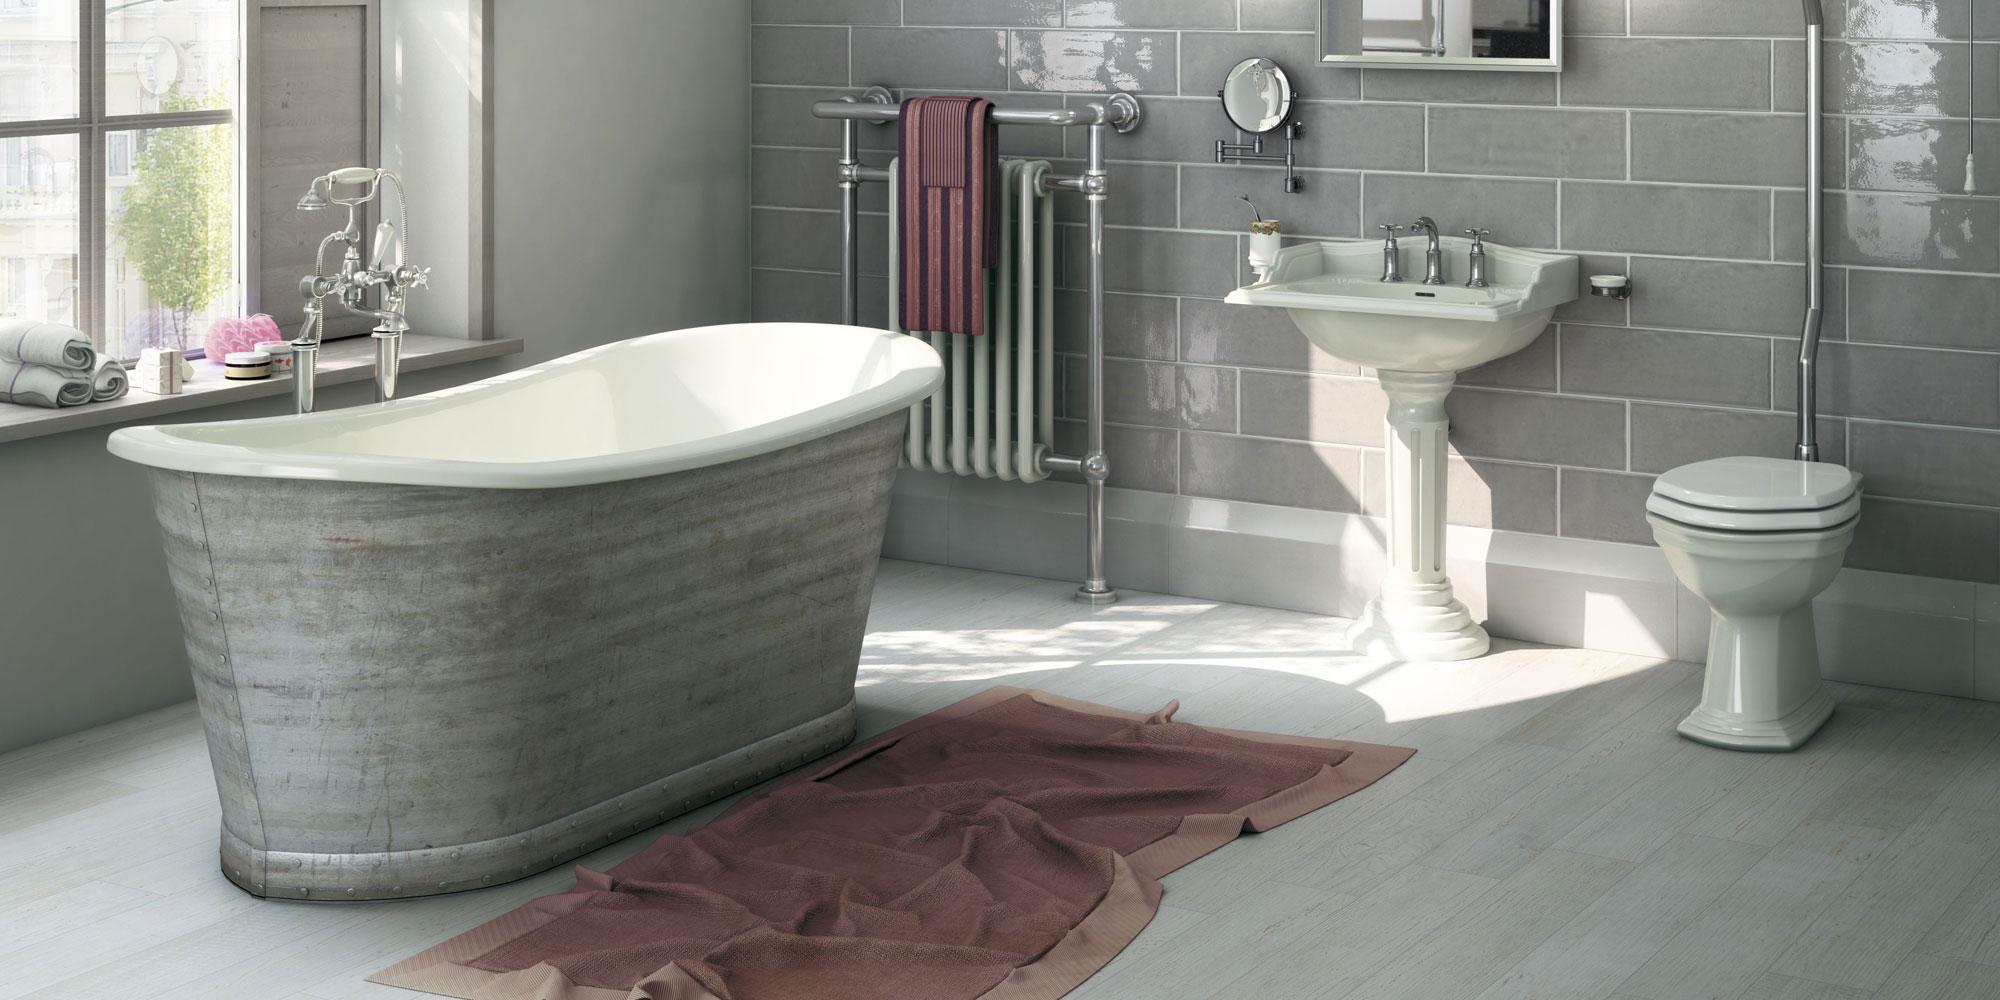 Ceramica Floor And Wall Ceramic Tiles